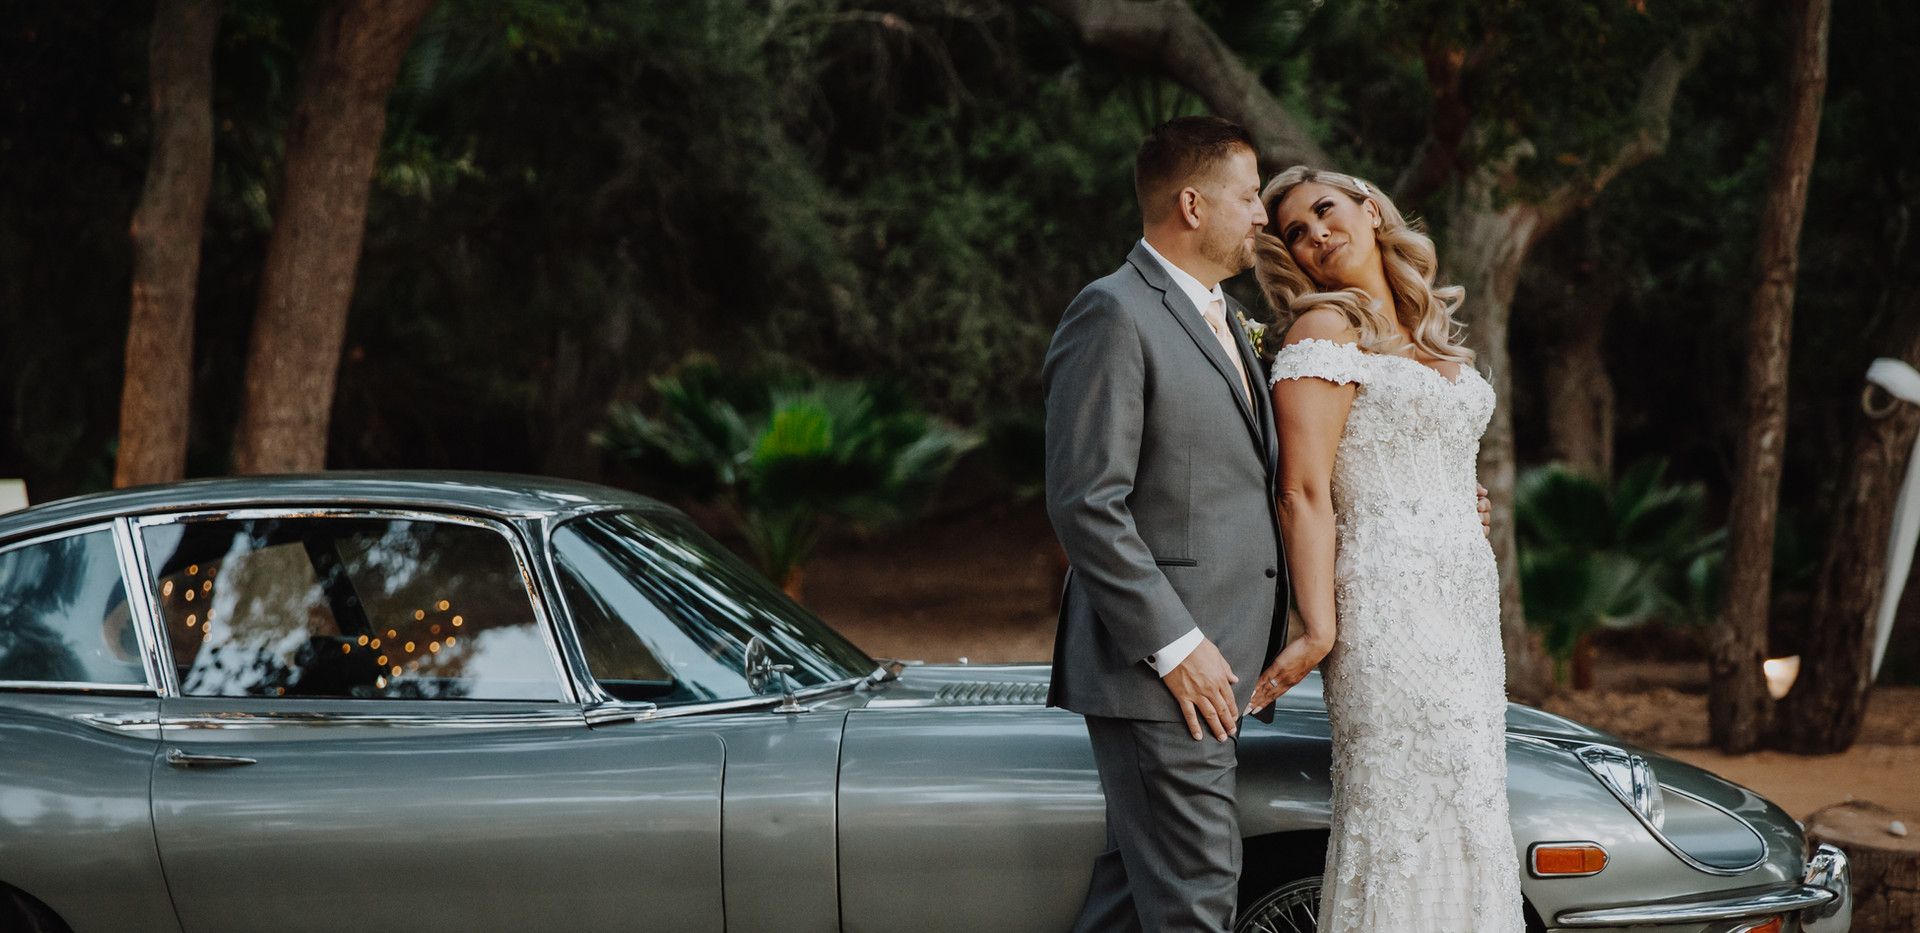 DOHRMAN_WEDDING_COUPLES_11.jpg